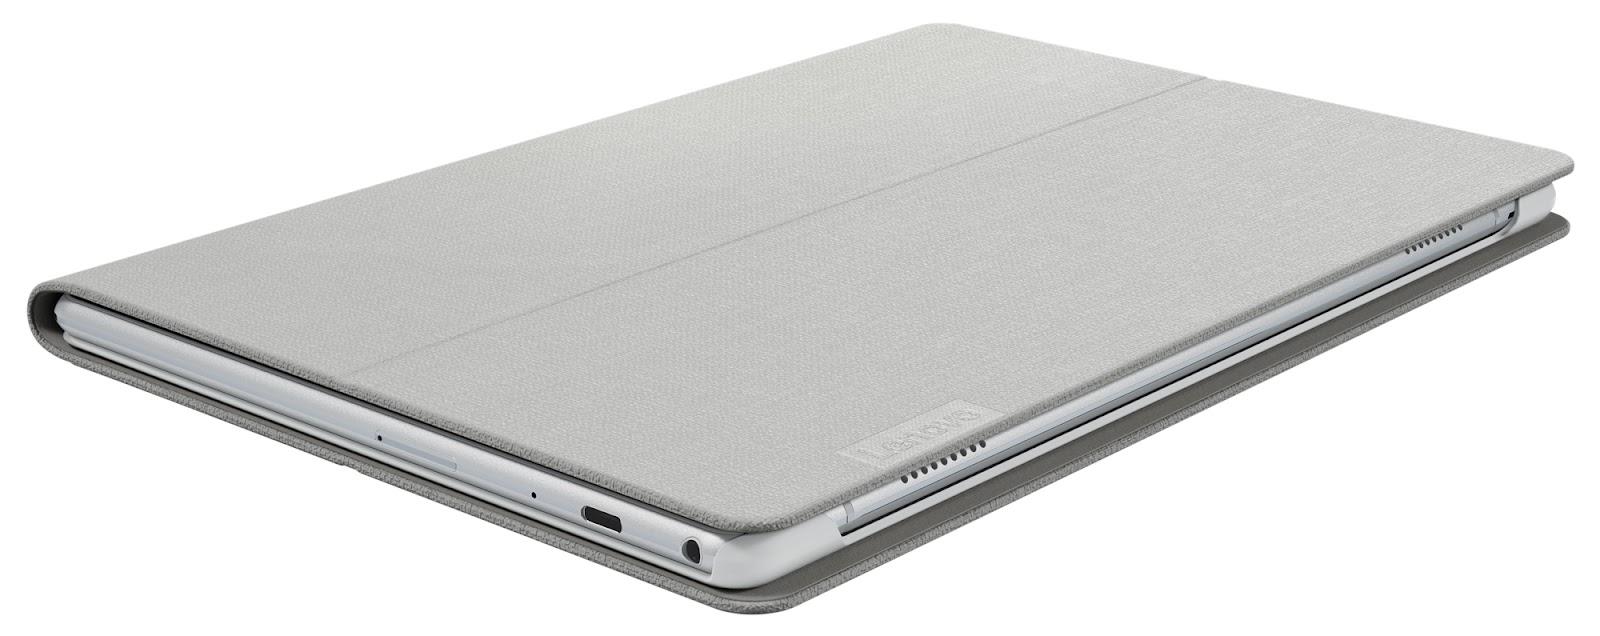 Фото 1. Чехол Lenovo TAB P10 Folio Case/Film White (ZG38C02586)